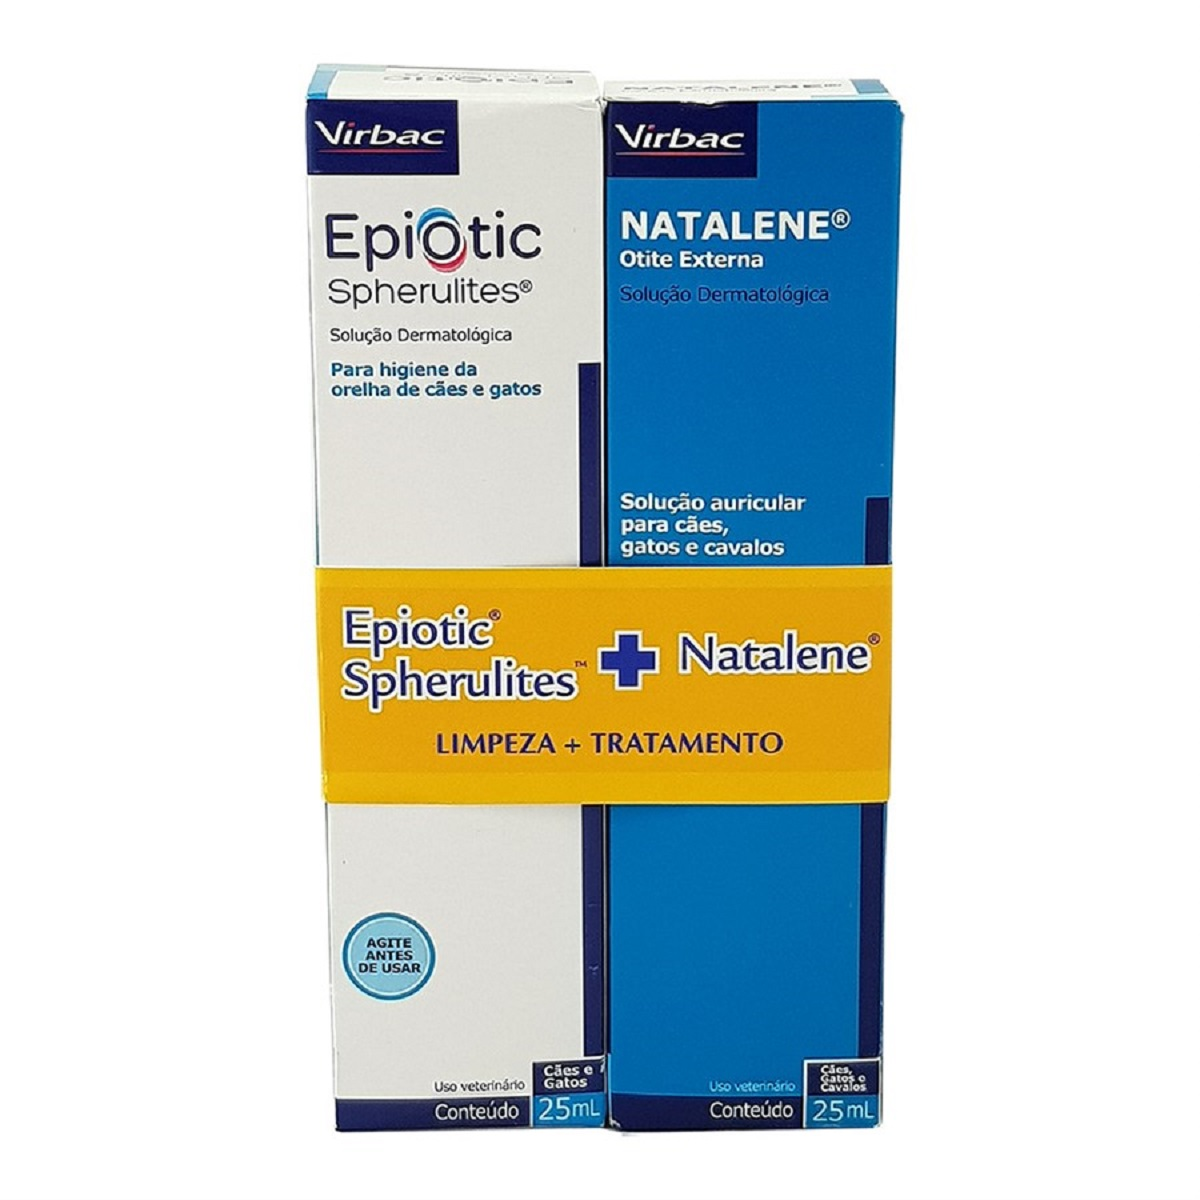 kit Medicamento e limpador para Otite Natalene  Virbac 25 ml